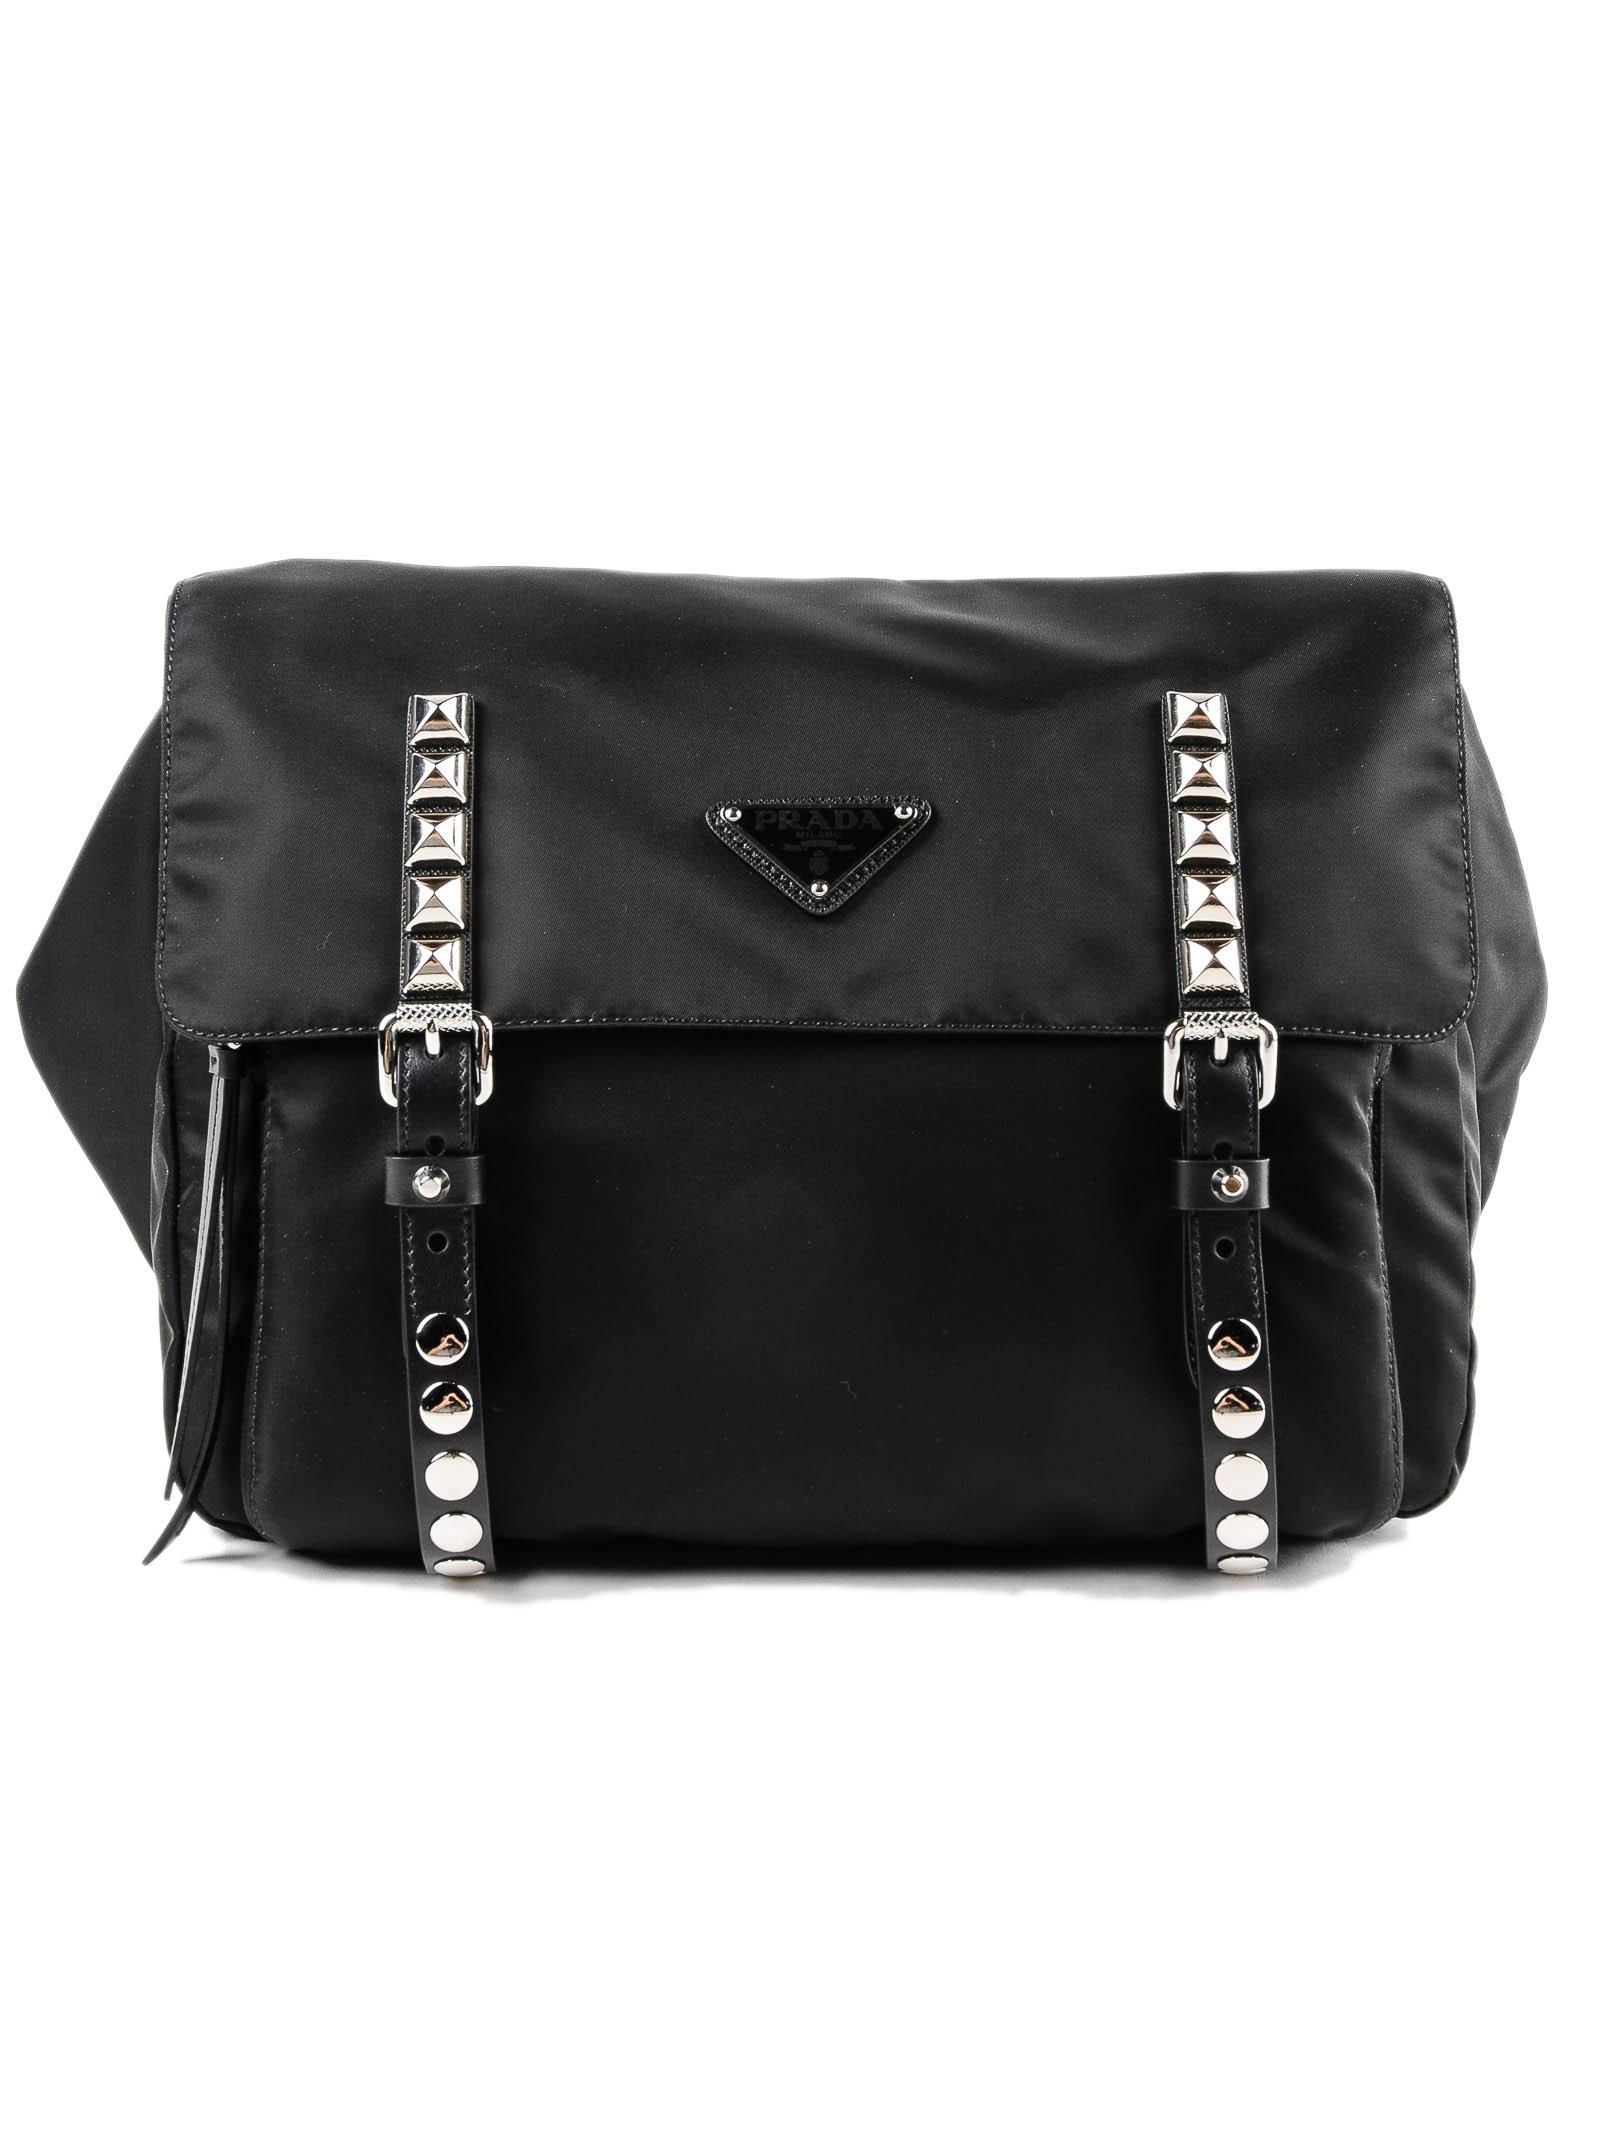 ac2ced91655 Lyst - Prada Belt Bag New Vela in Black